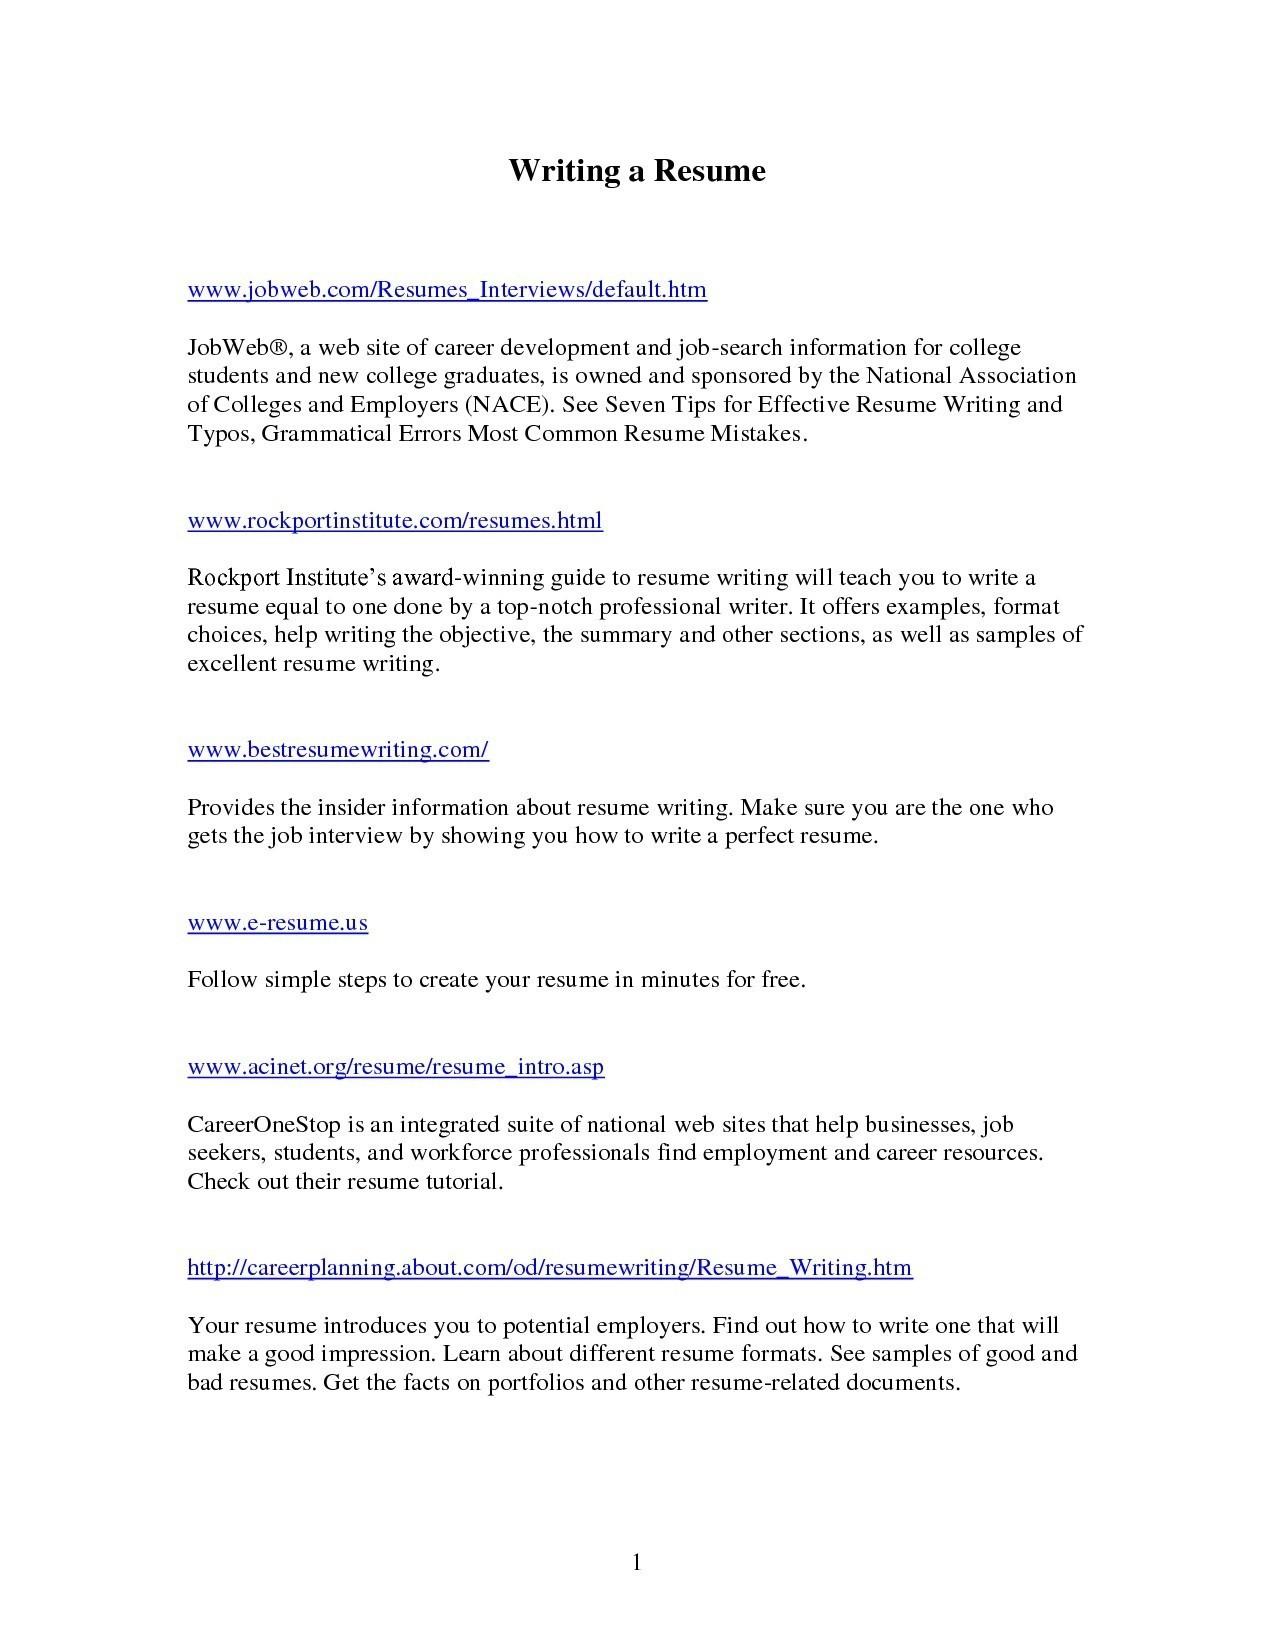 Free Job Offer Letter Template Word - Job Fer Letter Template Word New Job Fer Letter Template Fresh Job